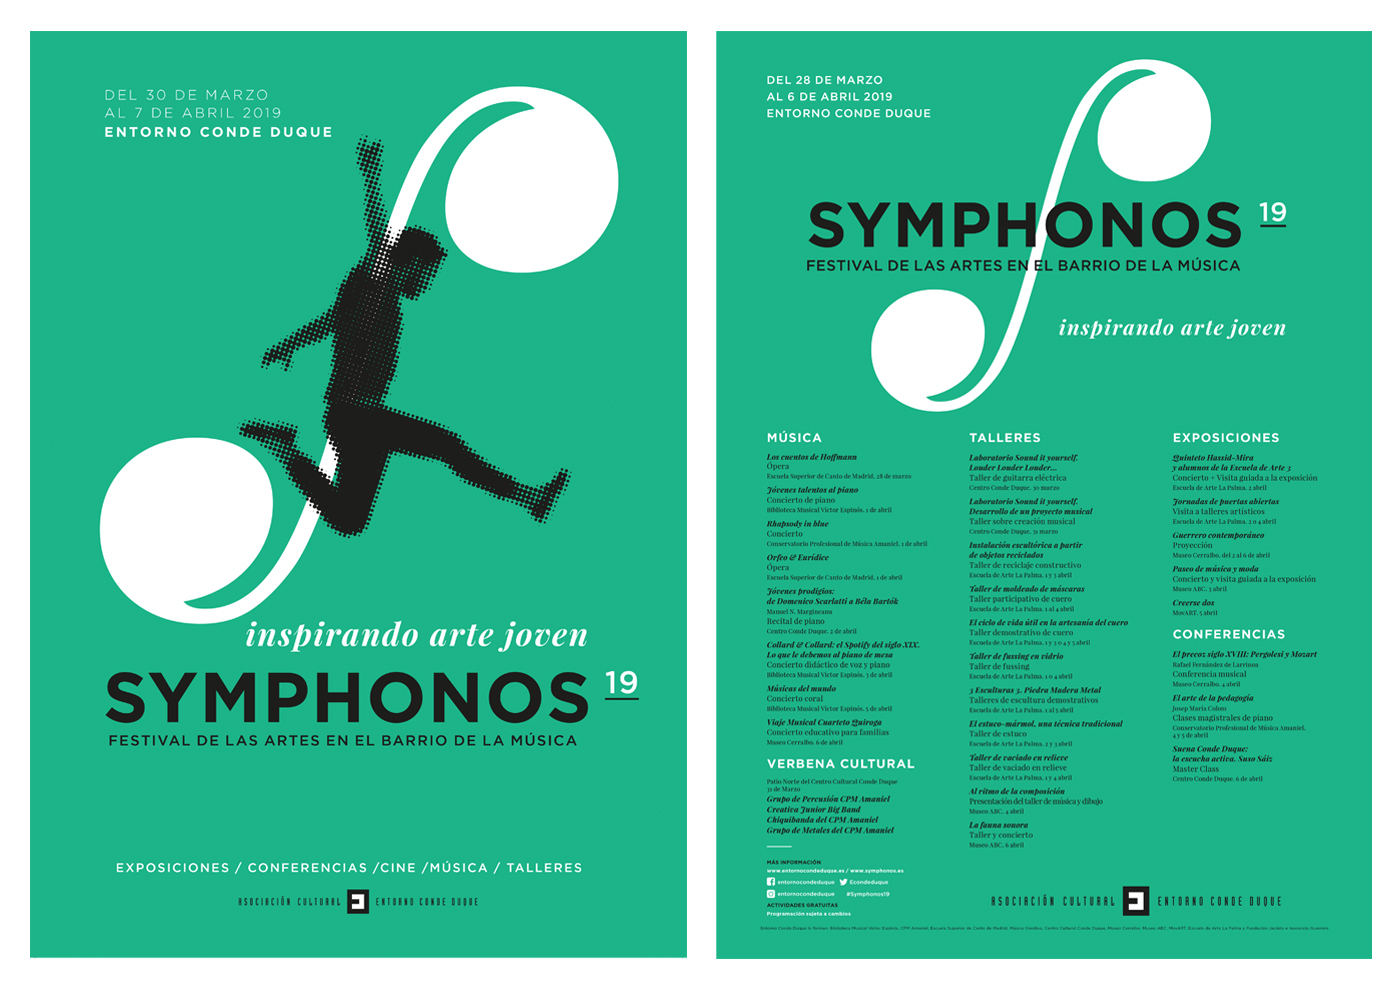 comp_symphonos_19.jpg